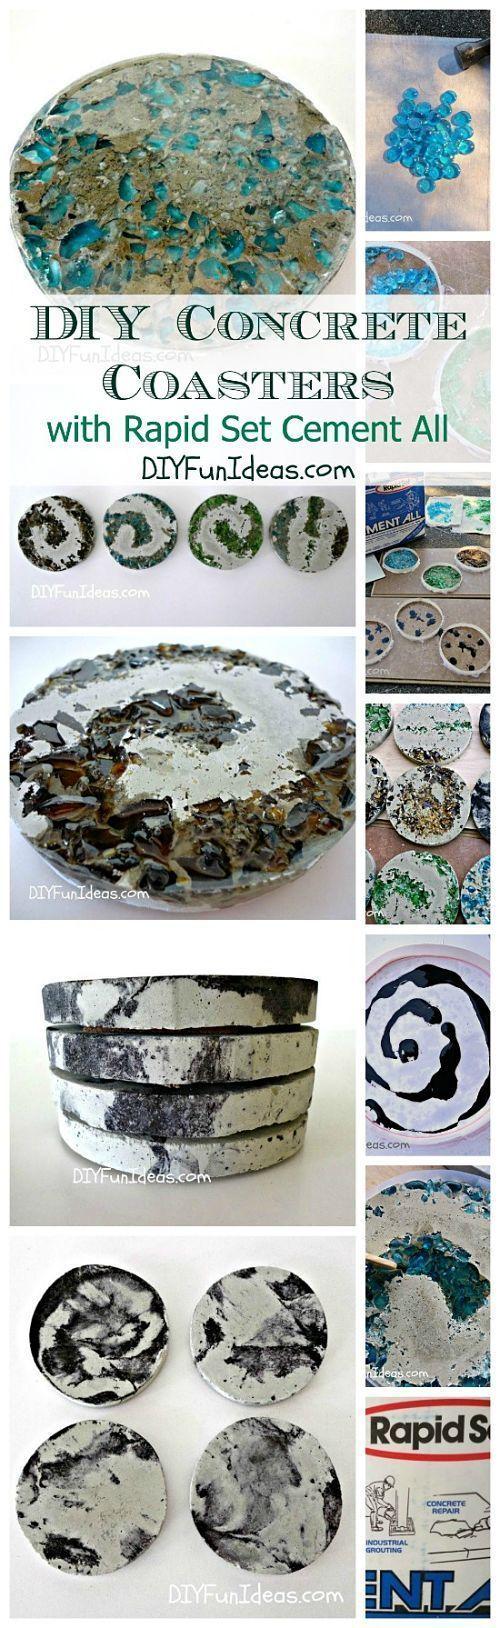 you asked for it! drool-worthy cement DIY ideas. Concrete Coasters via @diyfunideas1